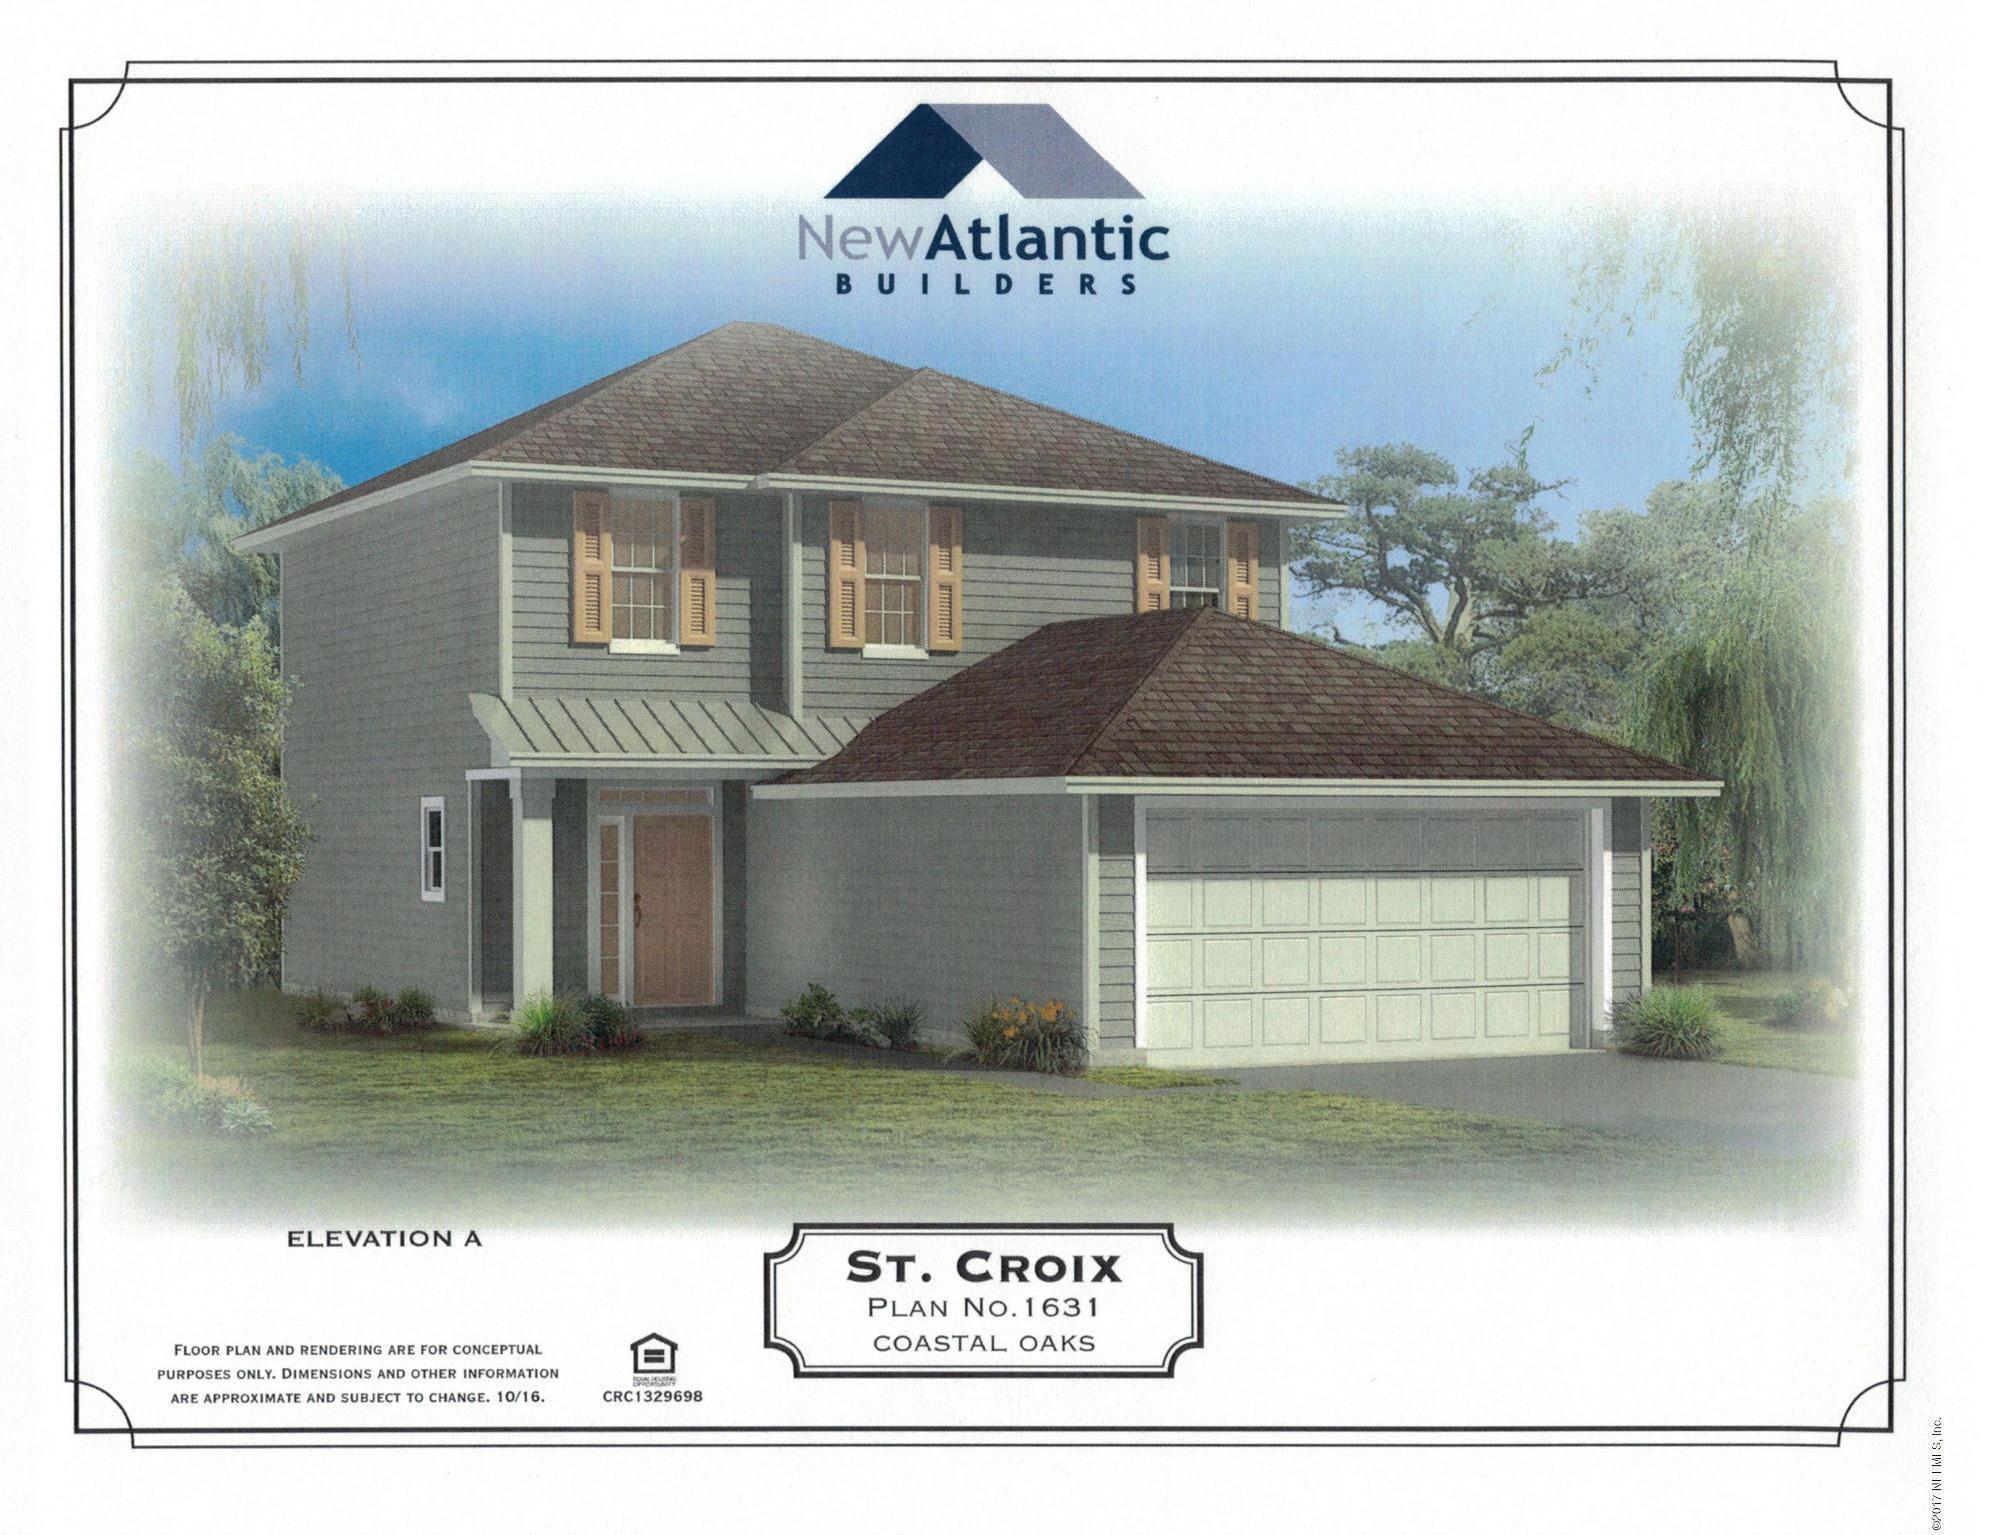 2265 SANDY BAY, JACKSONVILLE, FLORIDA 32233, 3 Bedrooms Bedrooms, ,2 BathroomsBathrooms,Residential - single family,For sale,SANDY BAY,957660